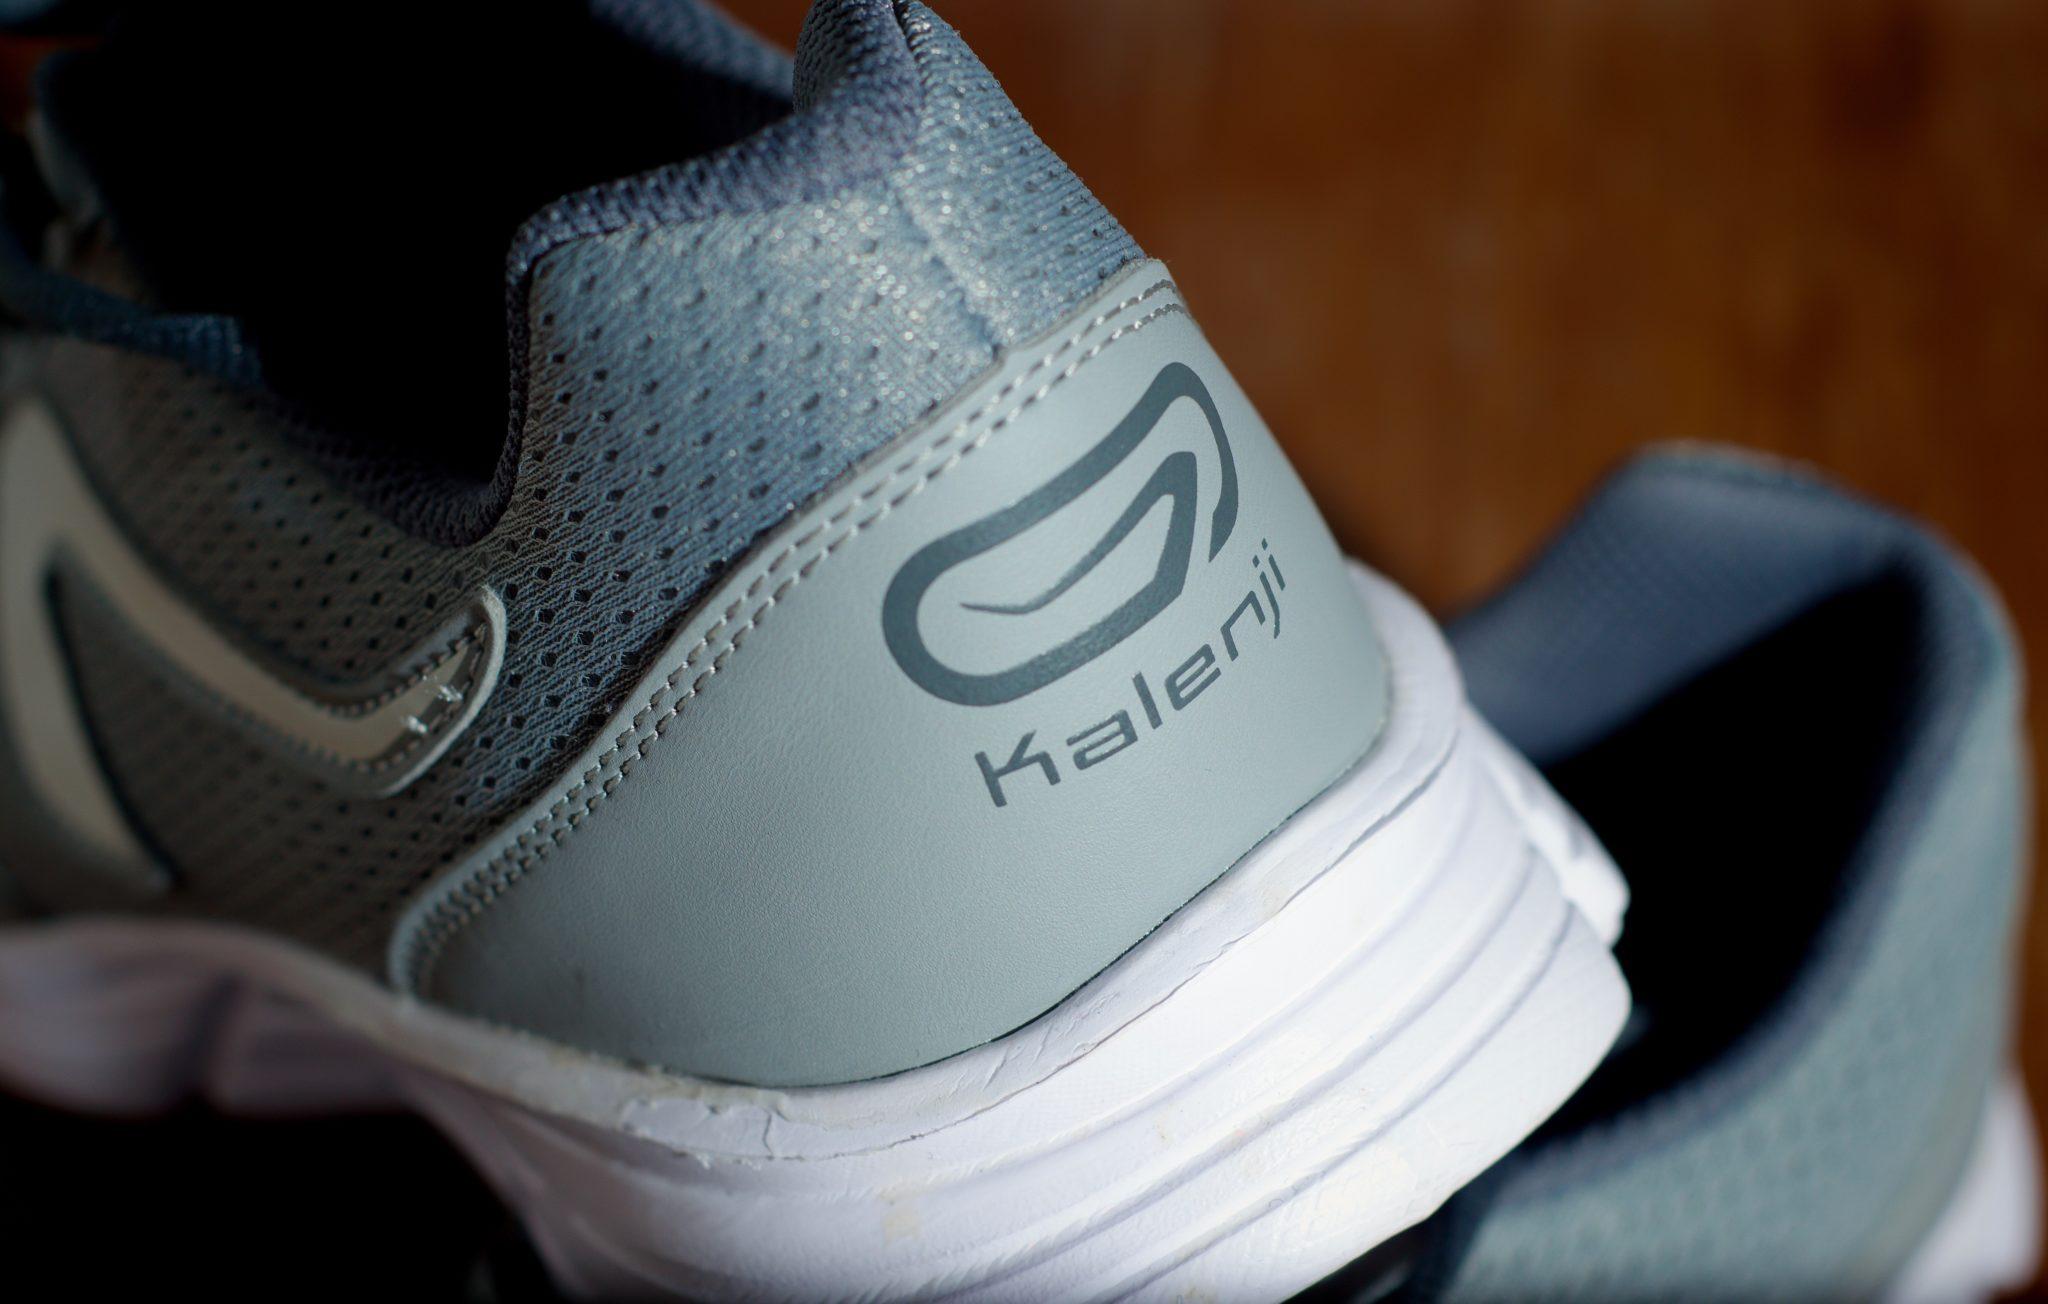 9acbd3f6c The weight of different Decathlon Kalenji running shoes - Bertrand van der  Berg